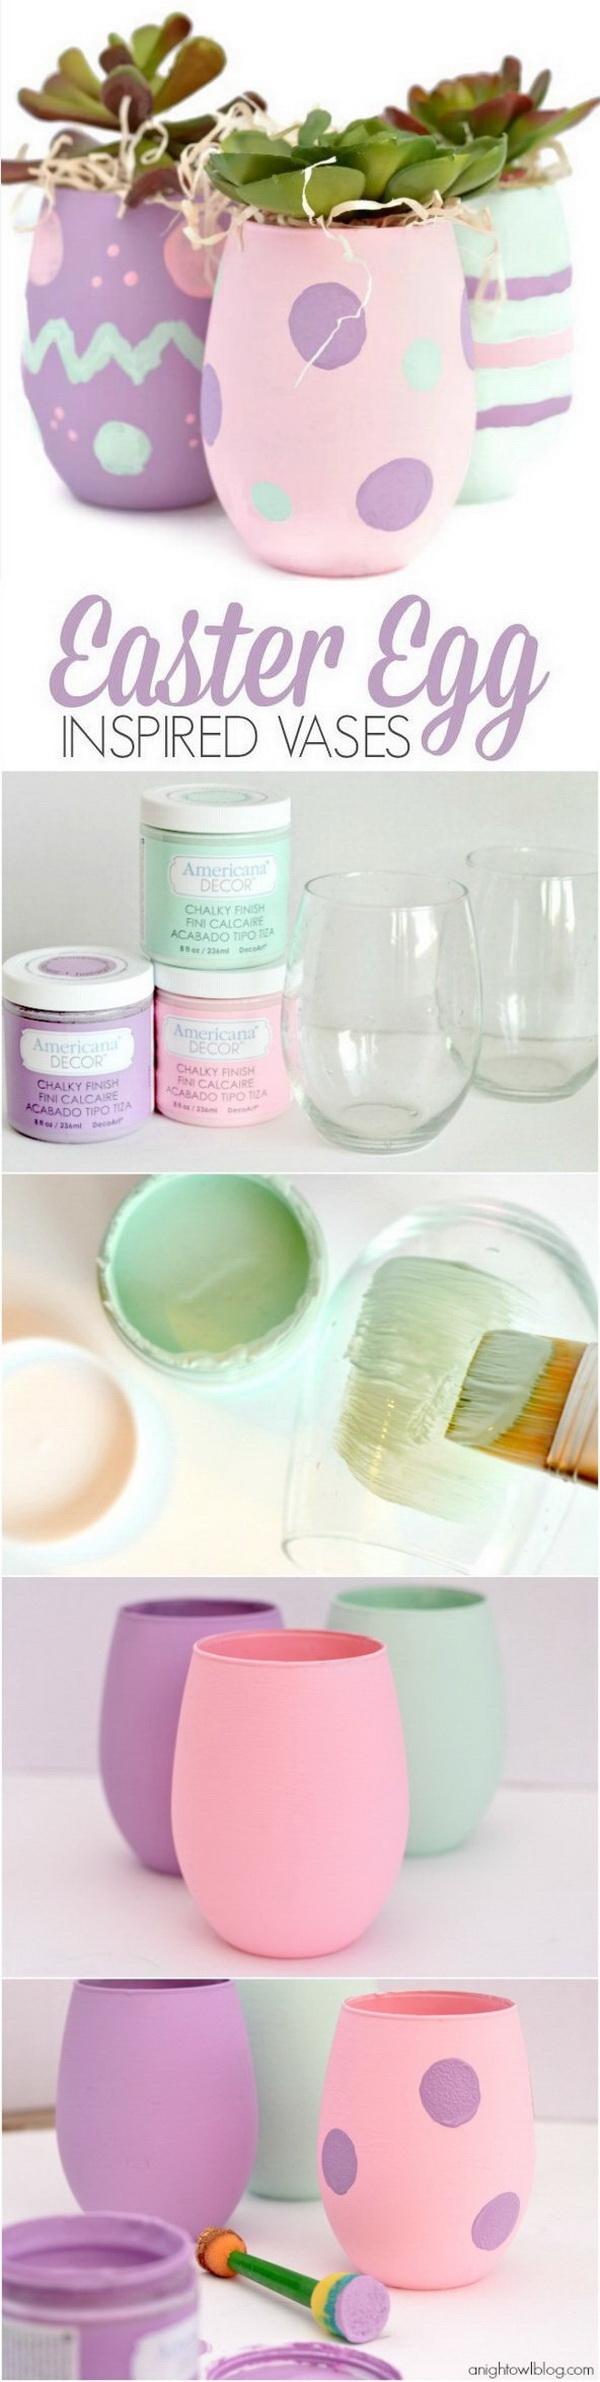 DIY Easter Decoration Ideas: Easter Egg Inspired Vases.